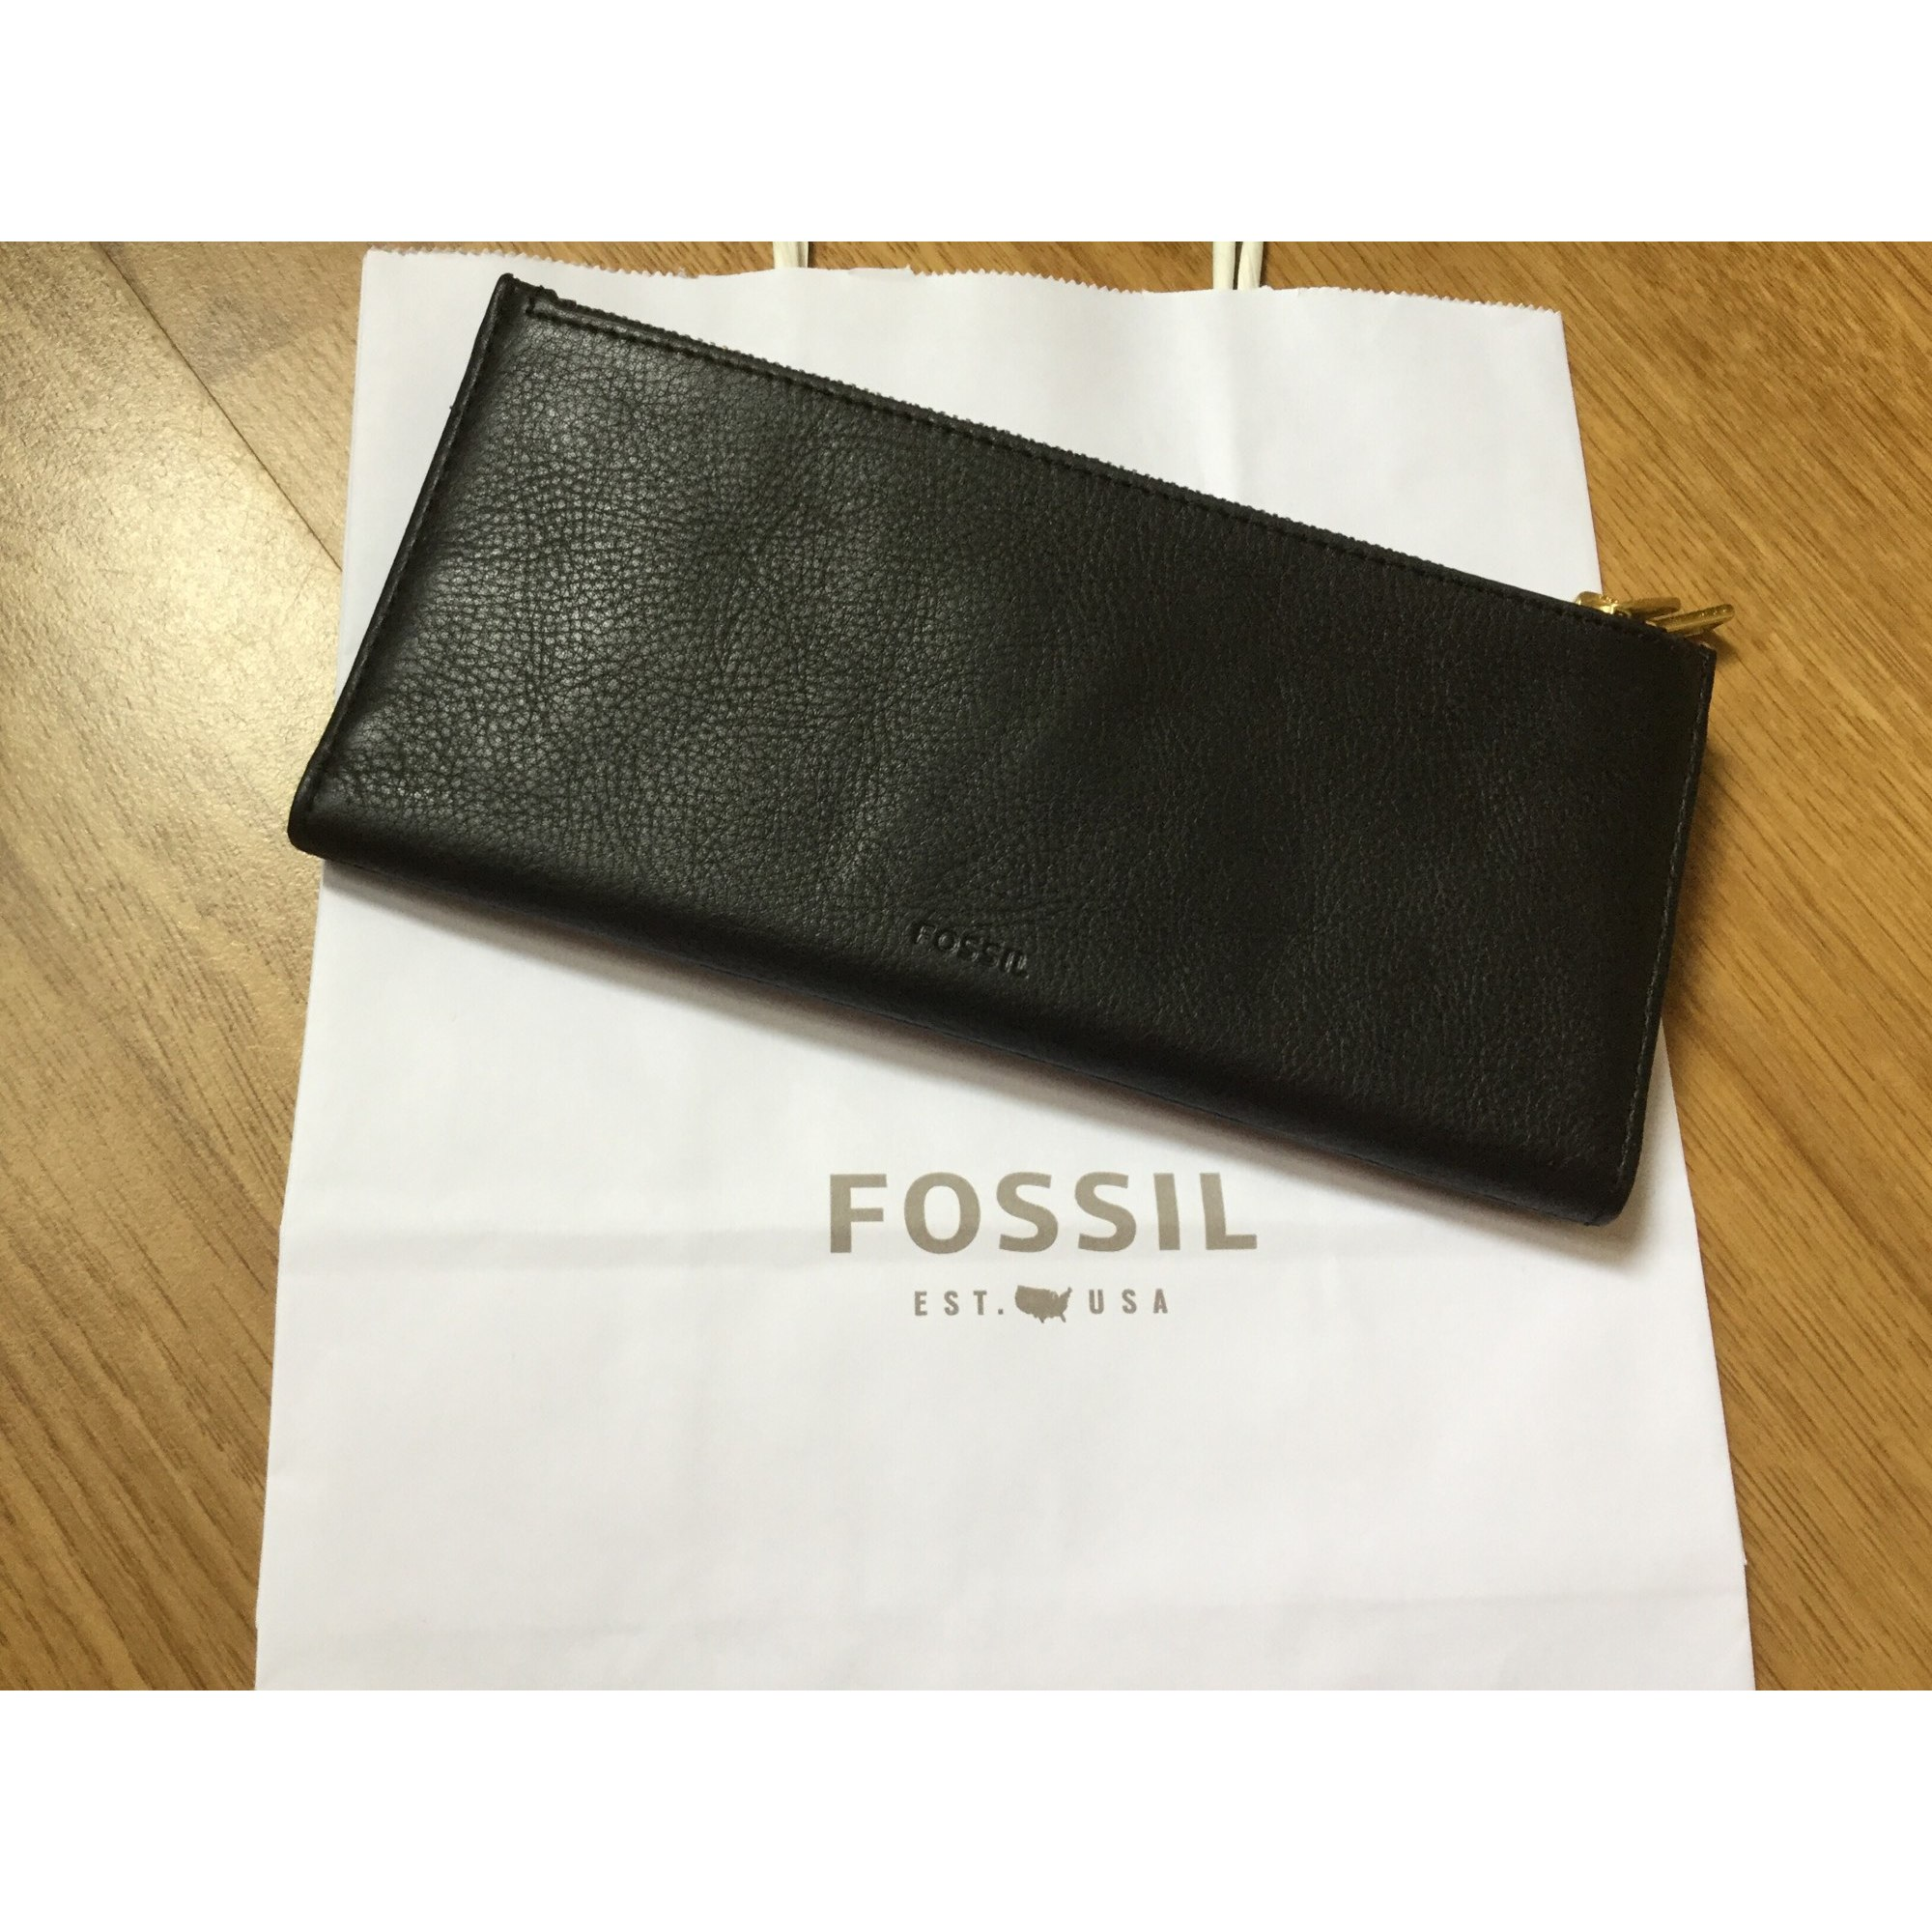 Portefeuille FOSSIL Noir